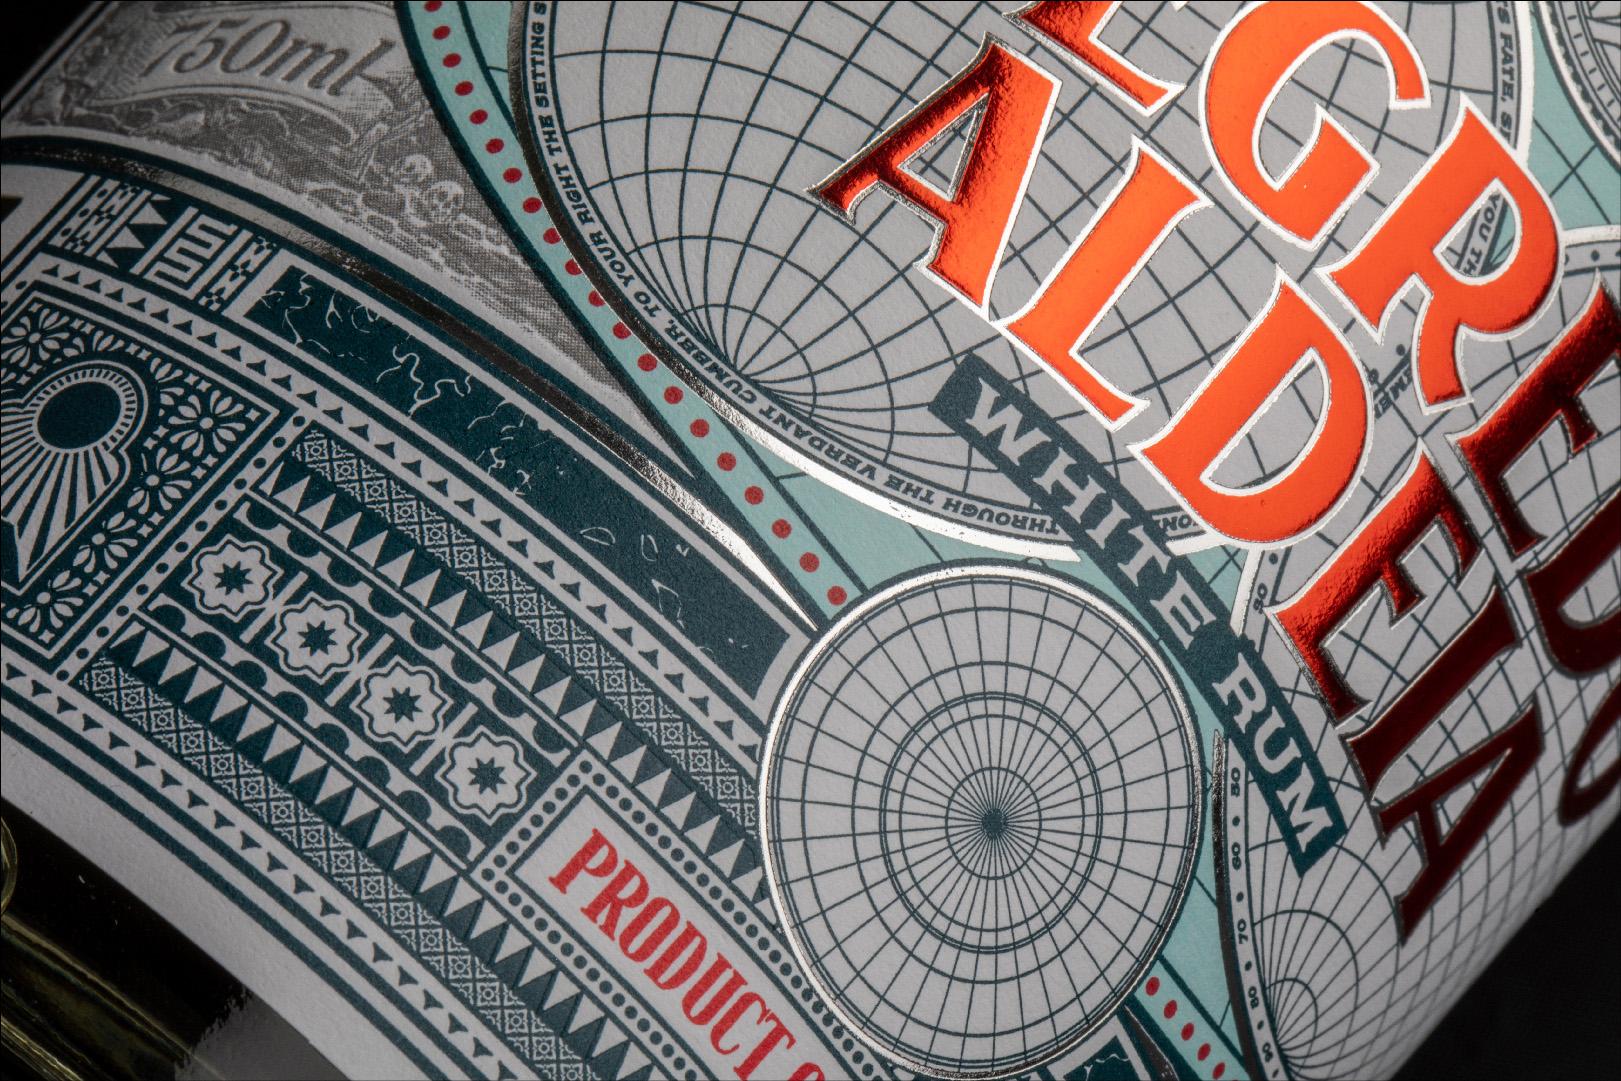 Packaging Design for Segredo Aldeia Rum by Fullarton Distilleries